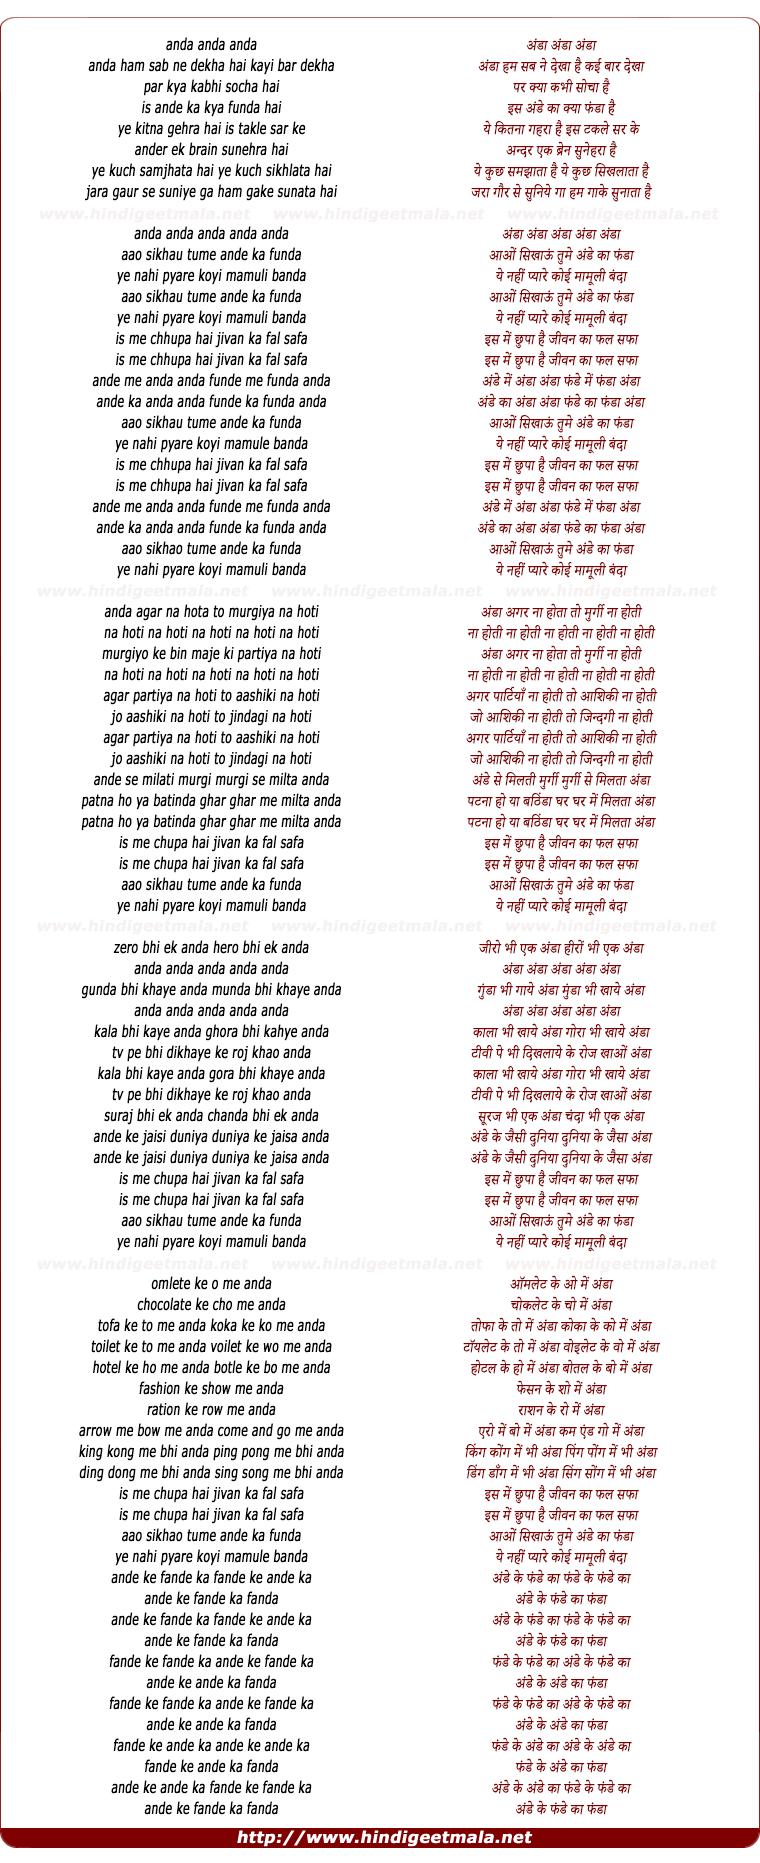 lyrics of song Aao SikhauTume Ande Ka Funda